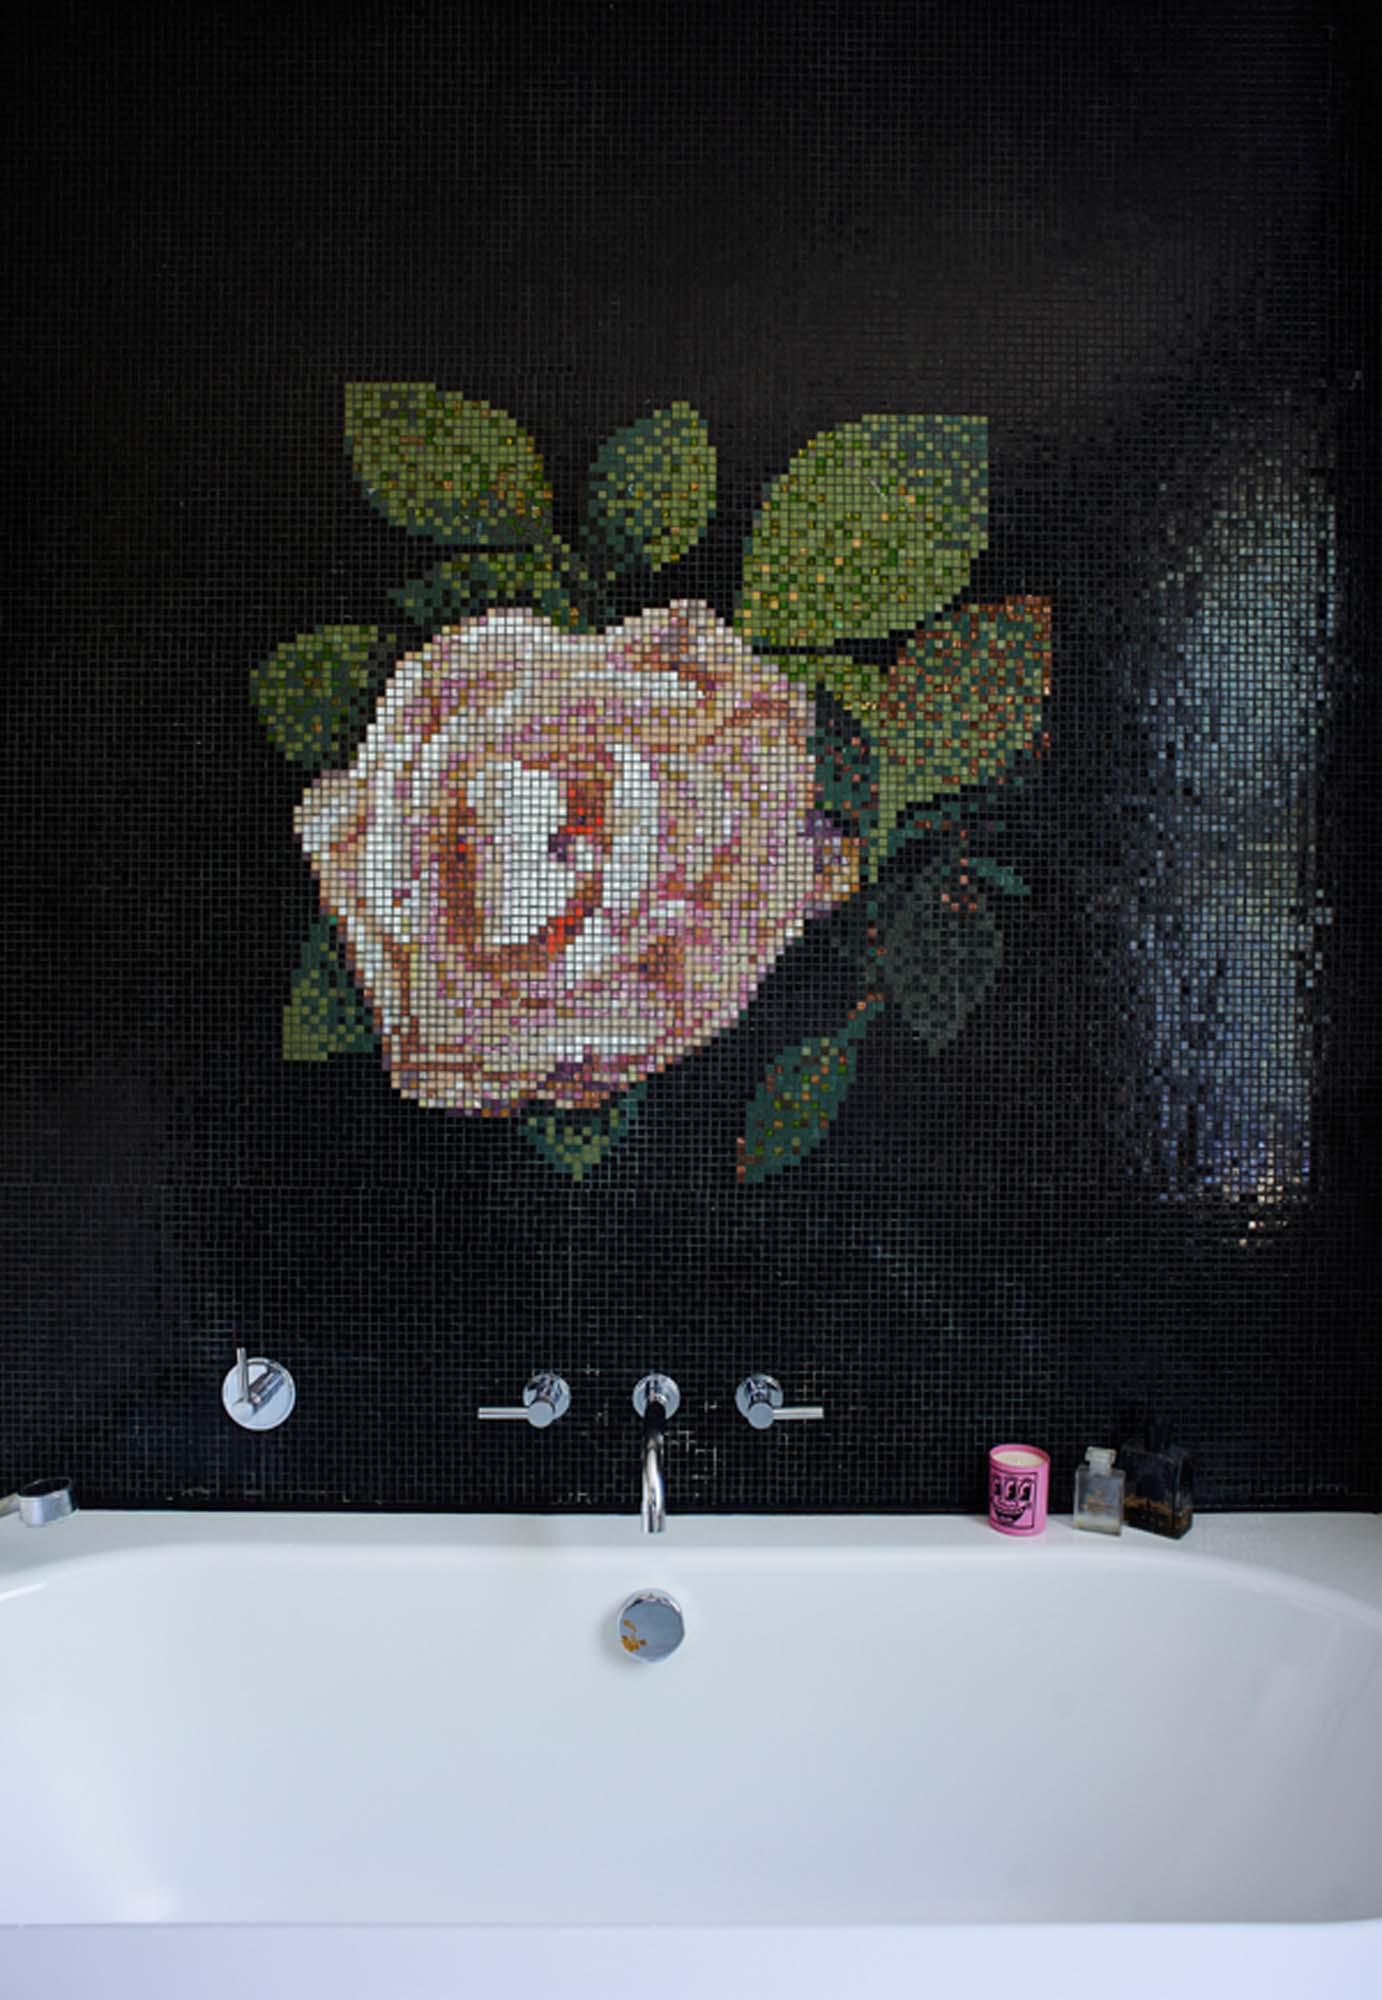 The flower mosaic in Zoe's bathroom